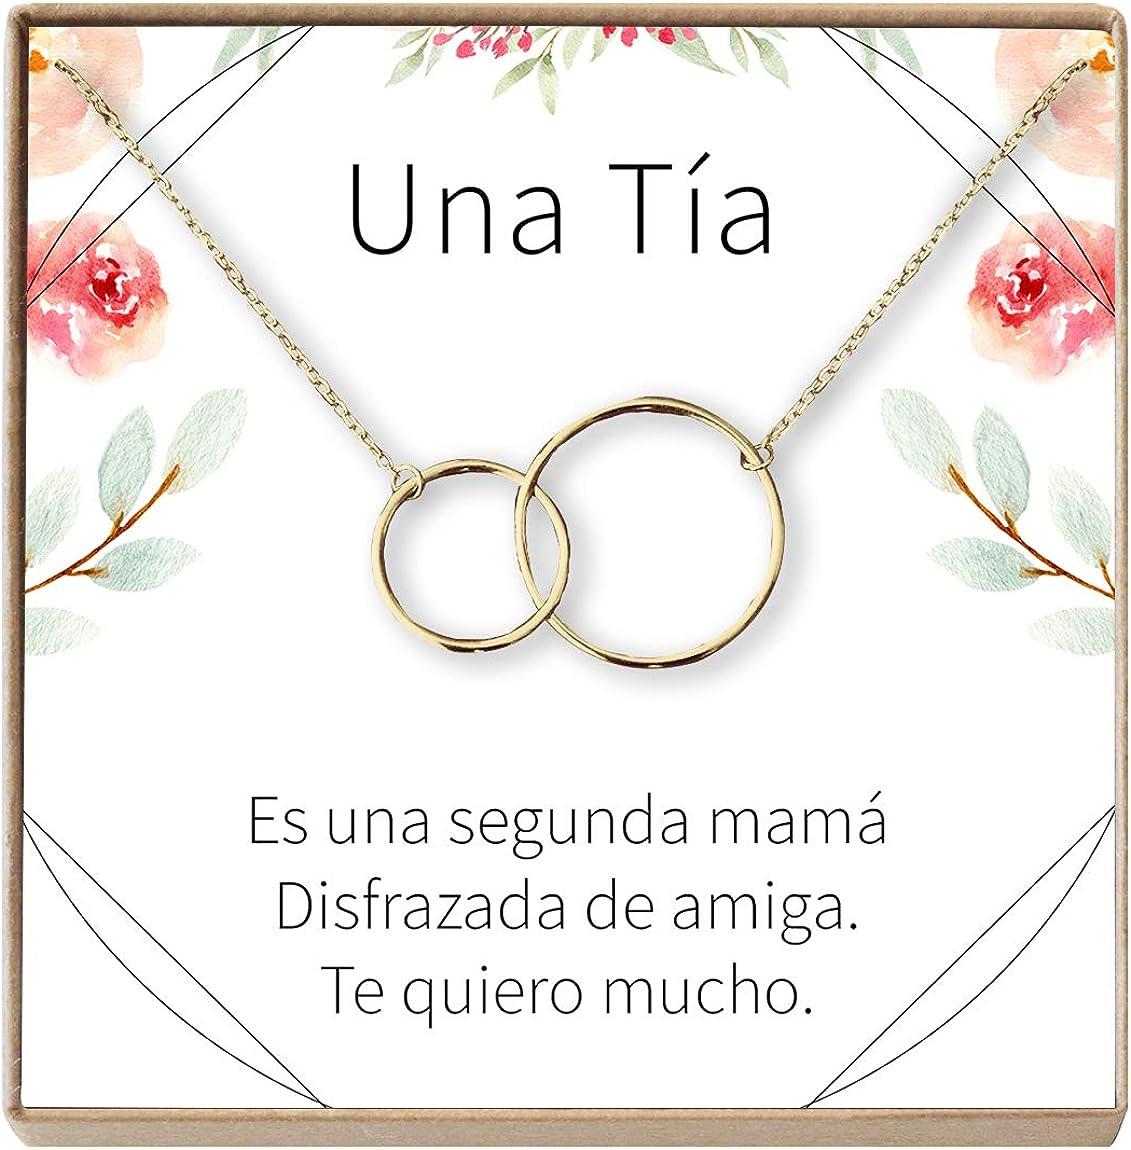 Amazon Com Collar Regalo Para Tia Joyeria Cumpleanos Dia De La Mujer Sobrina A Tia 2 Interlocking Circles Gold Plated Brass Na Clothing